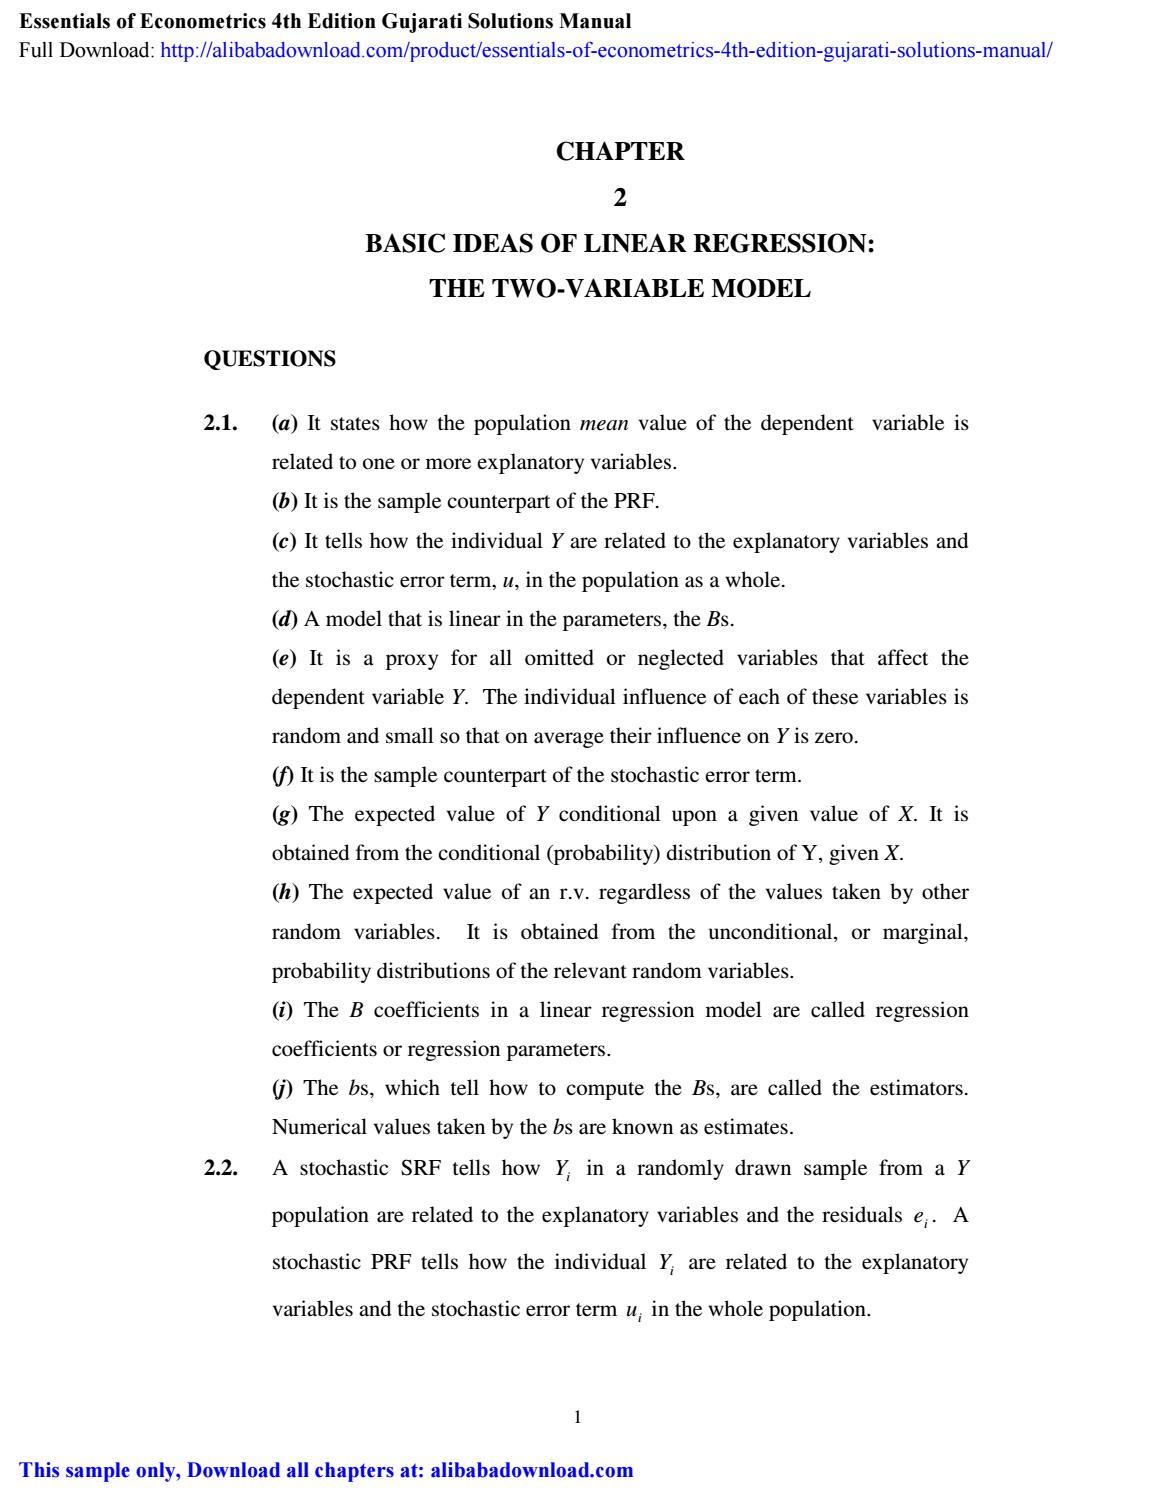 Essentials Of Econometrics 4th Edition Gujarati Solutions Manual By Carl Bentley Issuu